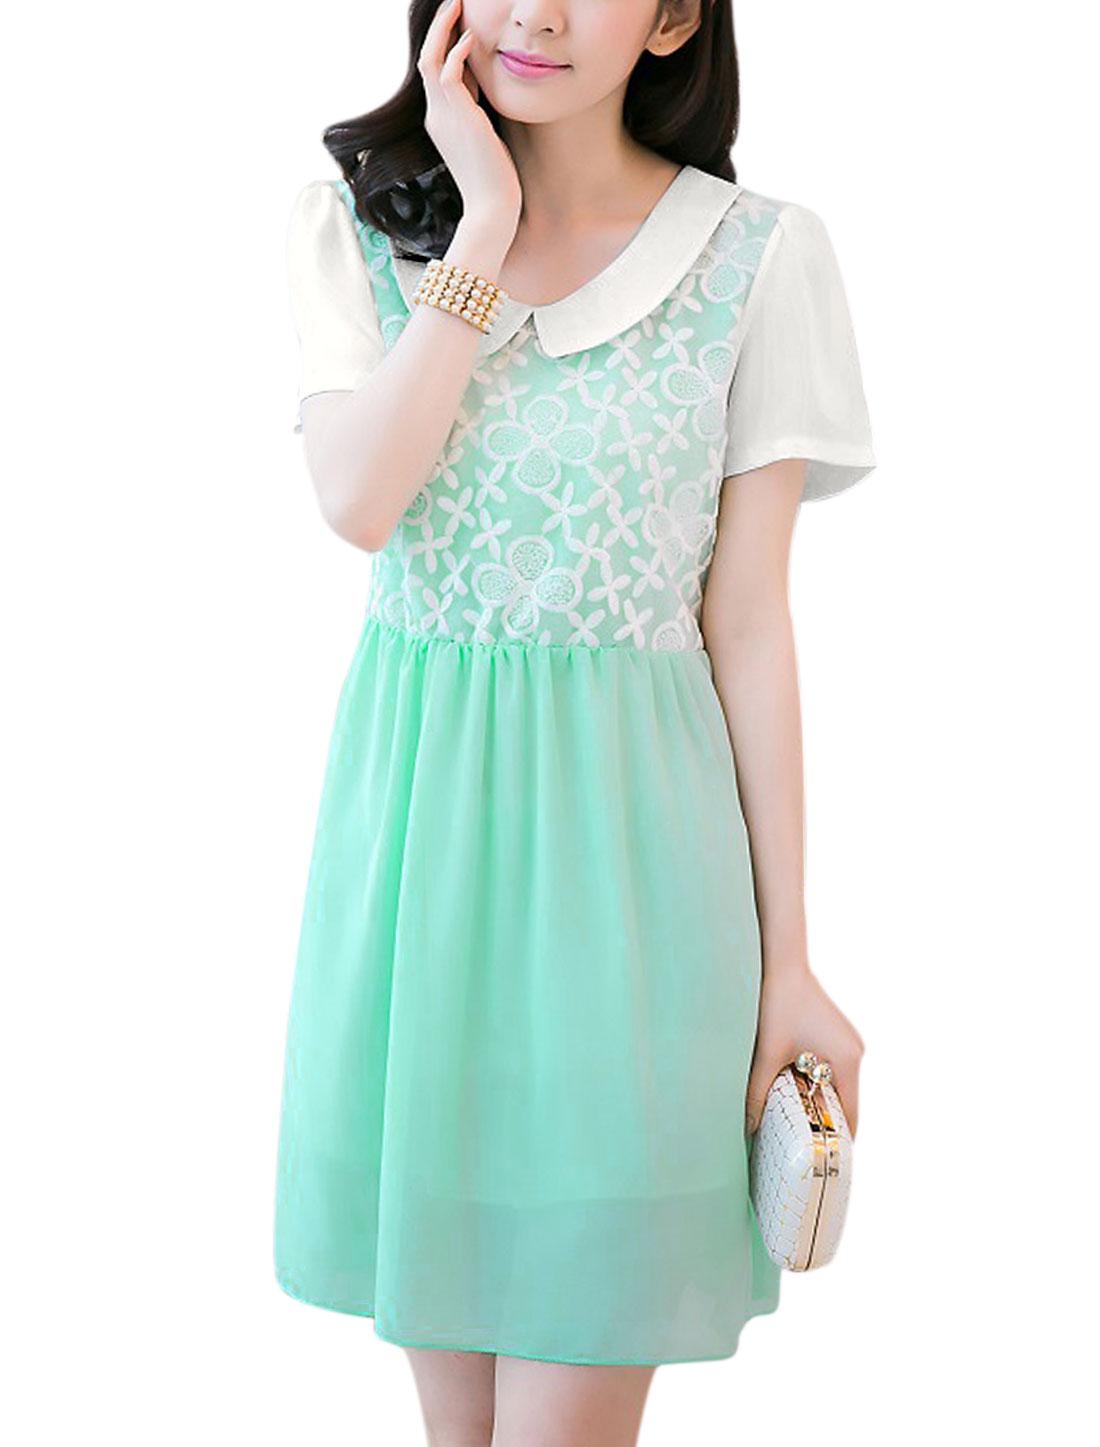 Women Doll Collar Self Tie Strap Organza Patch Chiffon Dress Mint M